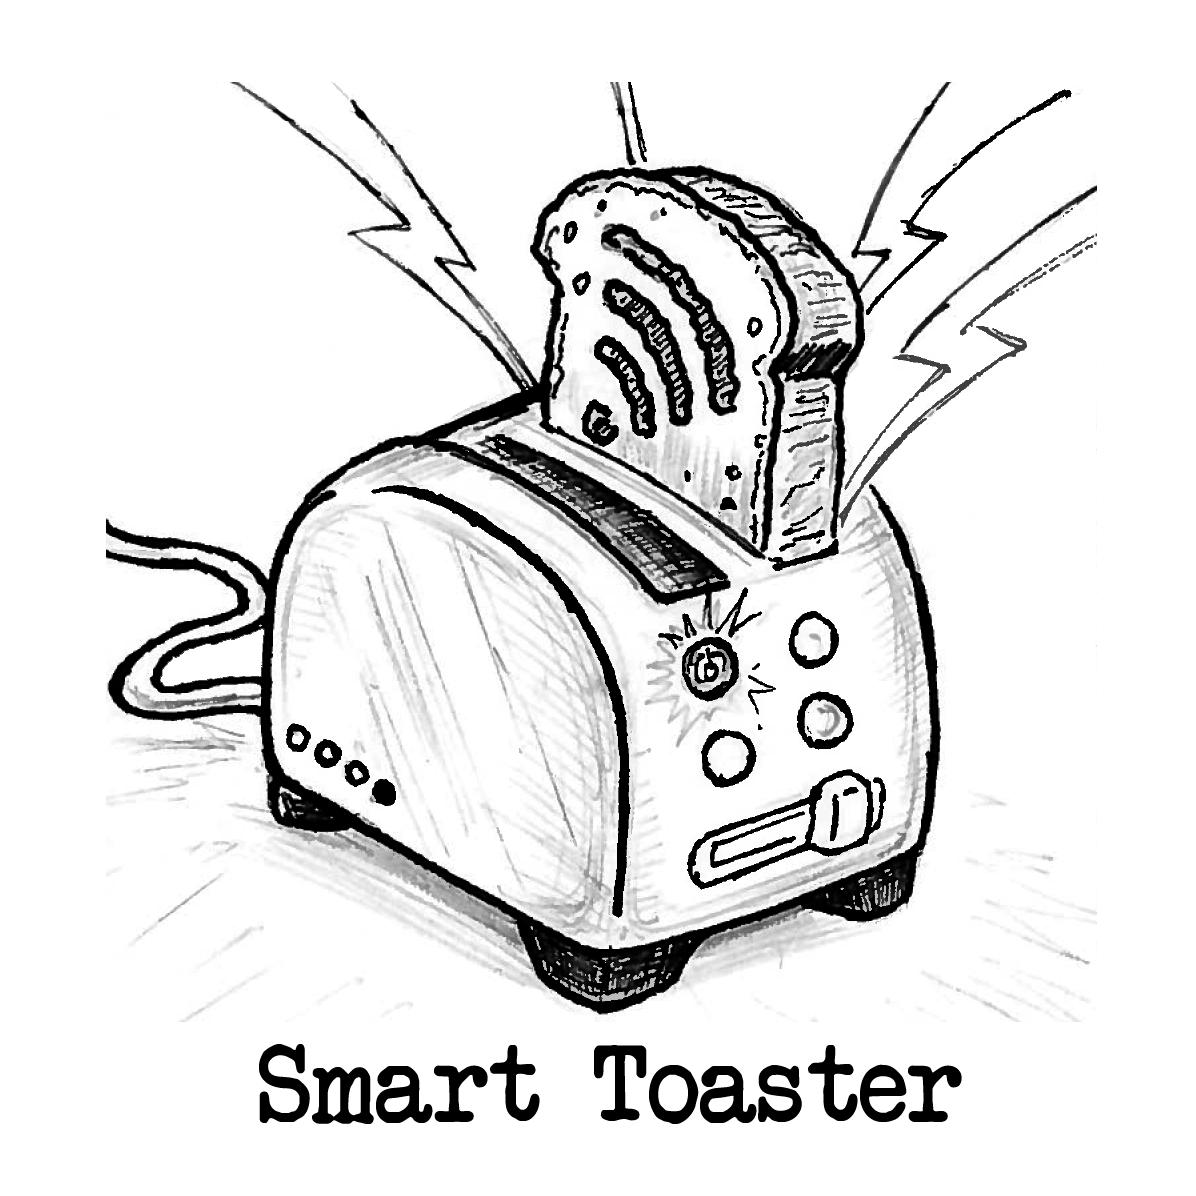 Smartoaster